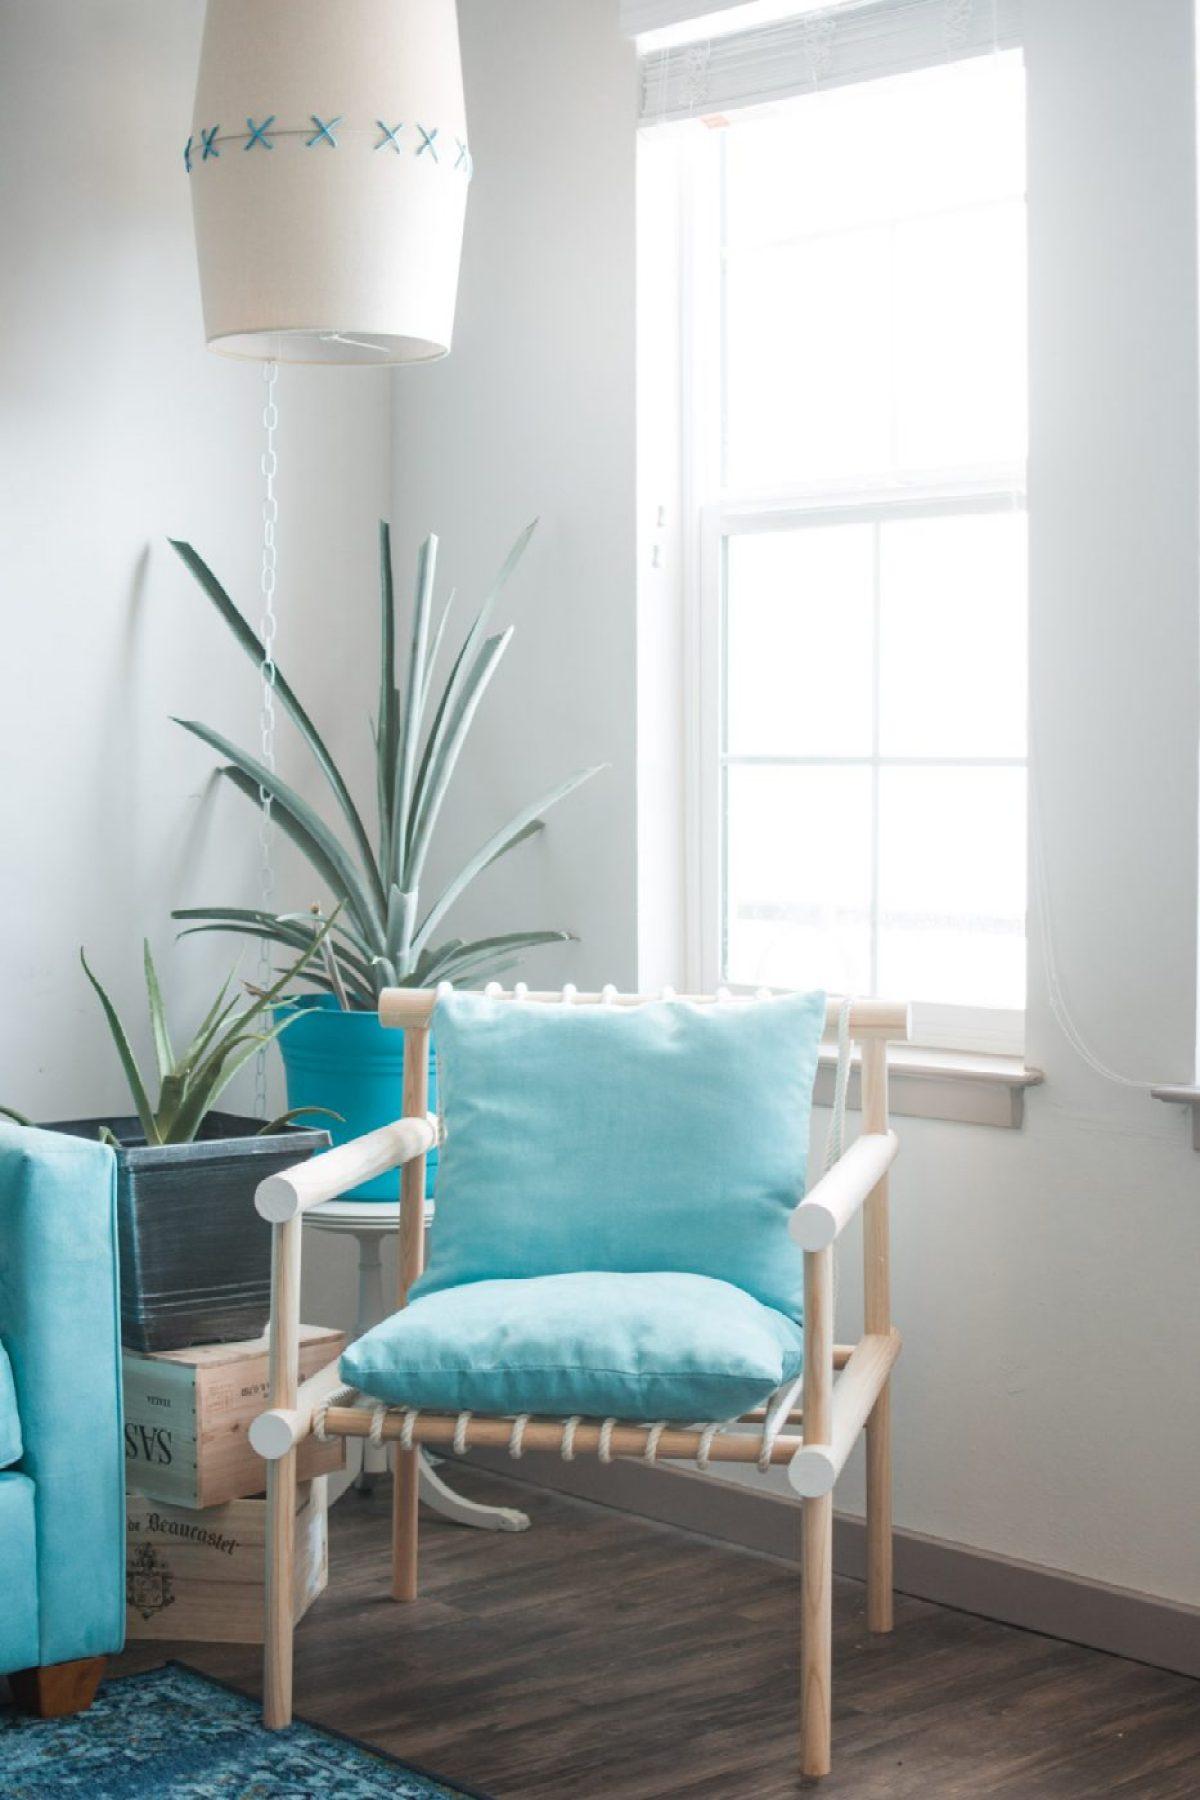 Boho Tropical Living Room DIY Chair - Sweet Teal